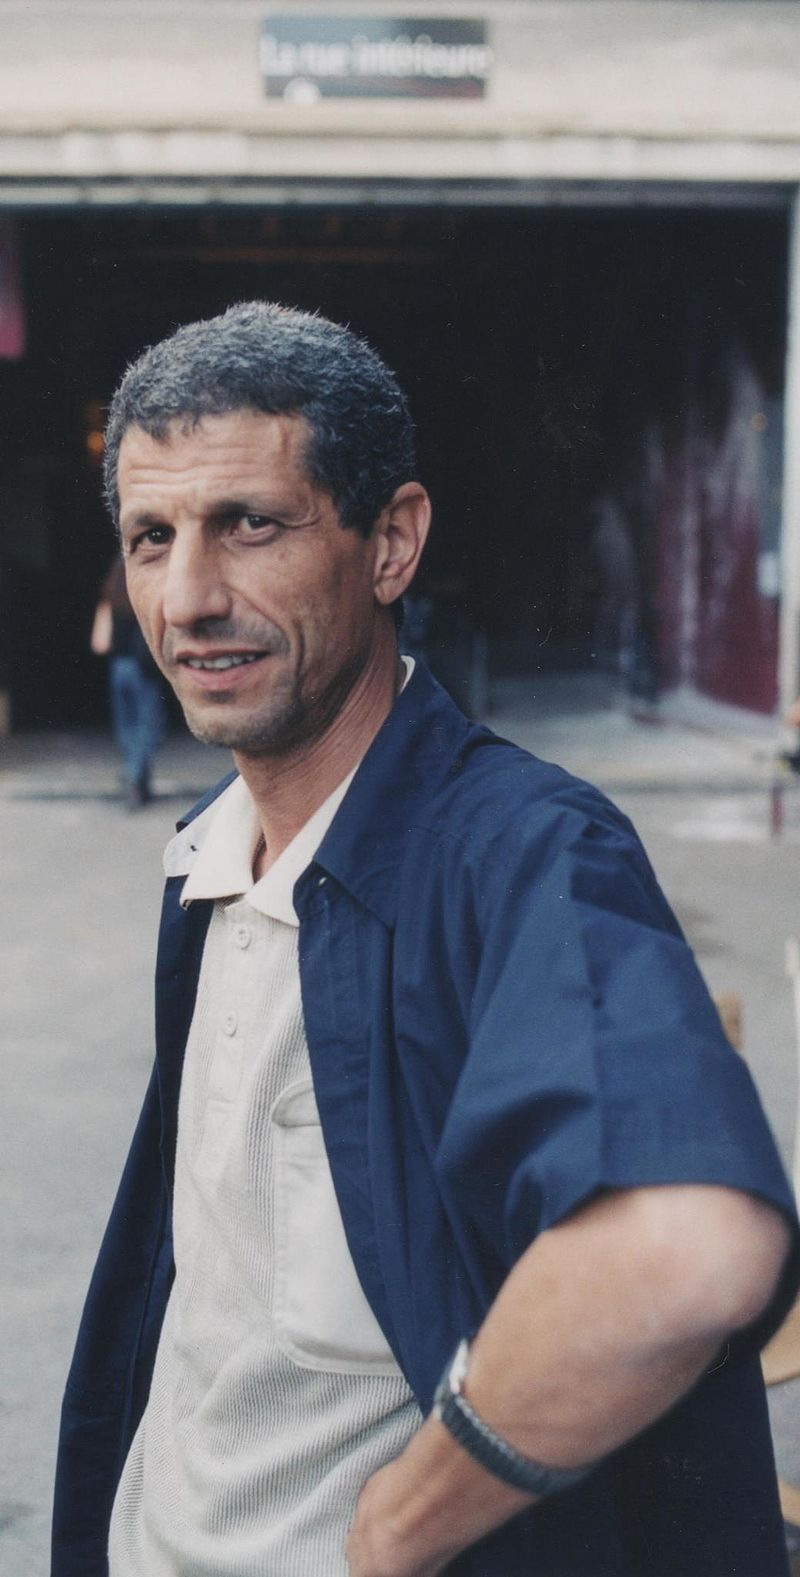 Hellal Zoubir, artiste plasticien et designer